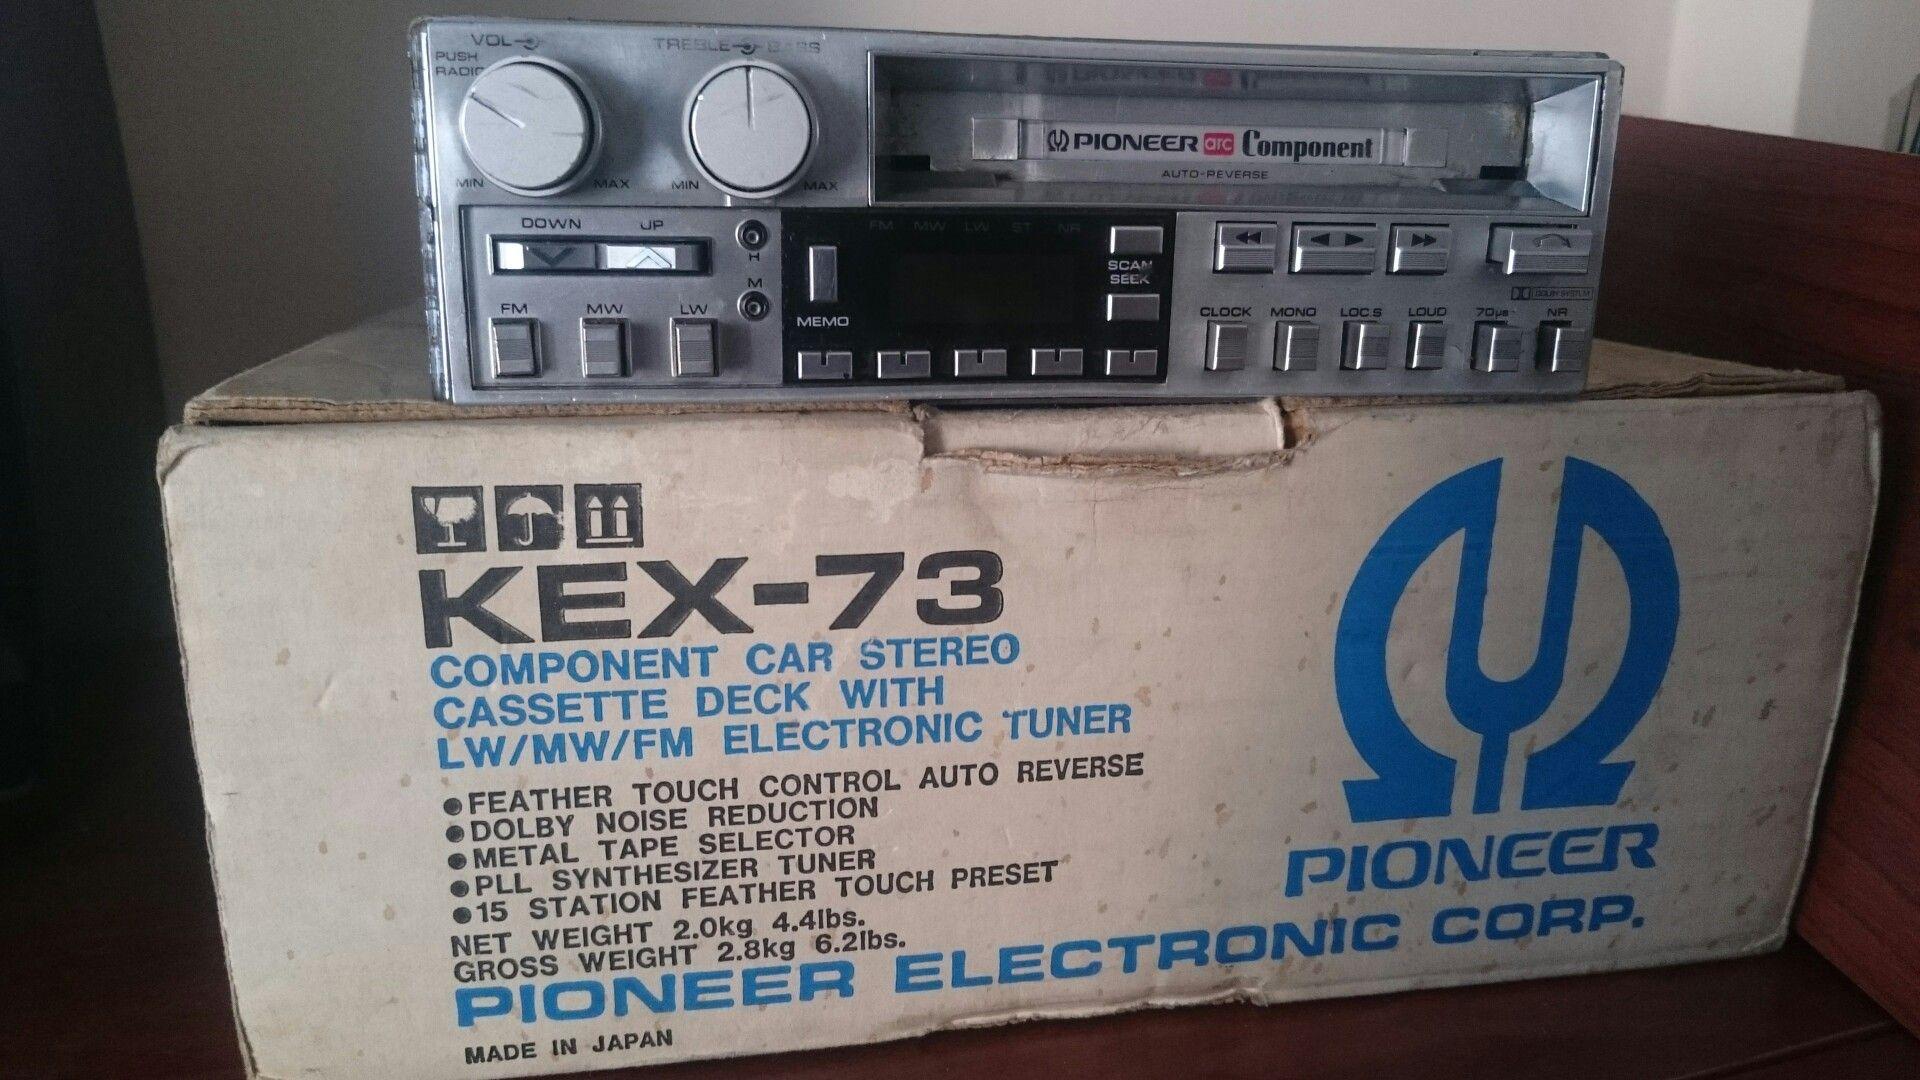 Vntage kex 73 poneer car stereo pinterest vntage kex 73 fandeluxe Gallery